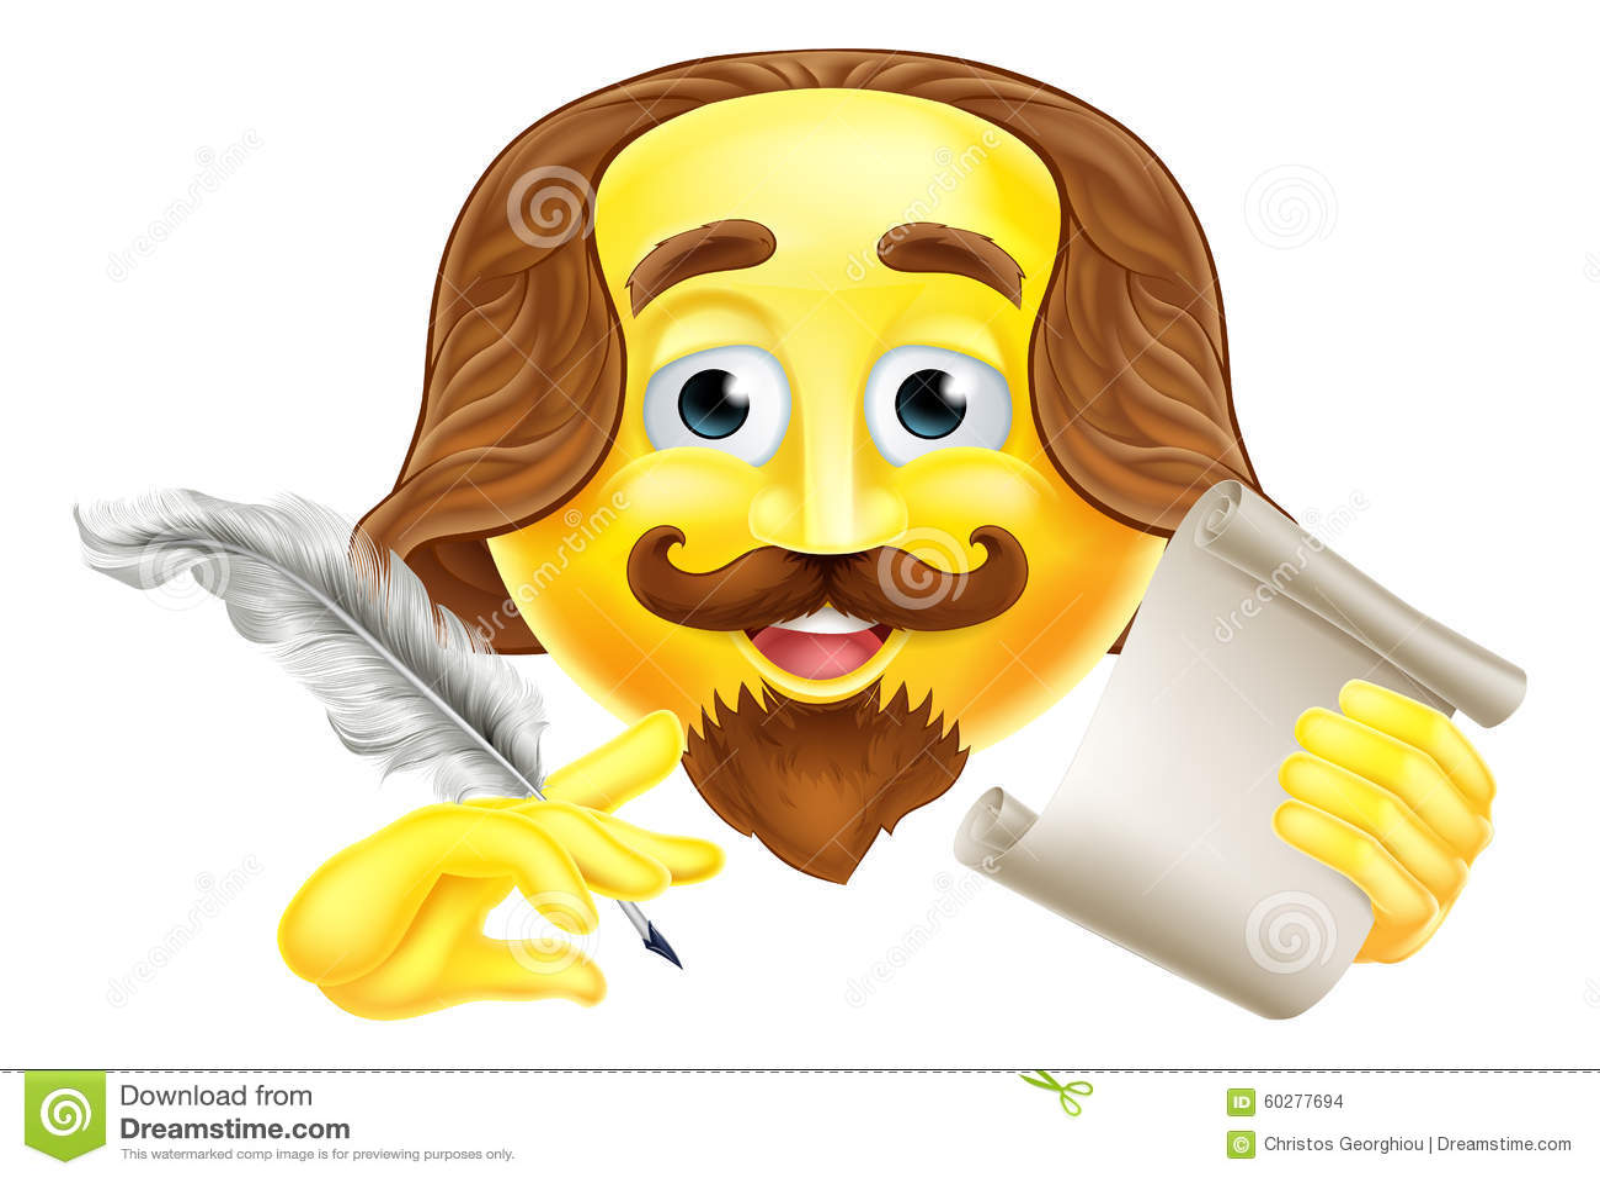 Clip Art Shakespeare Clipart shakespeare stock illustrations 214 emoji emoticon images